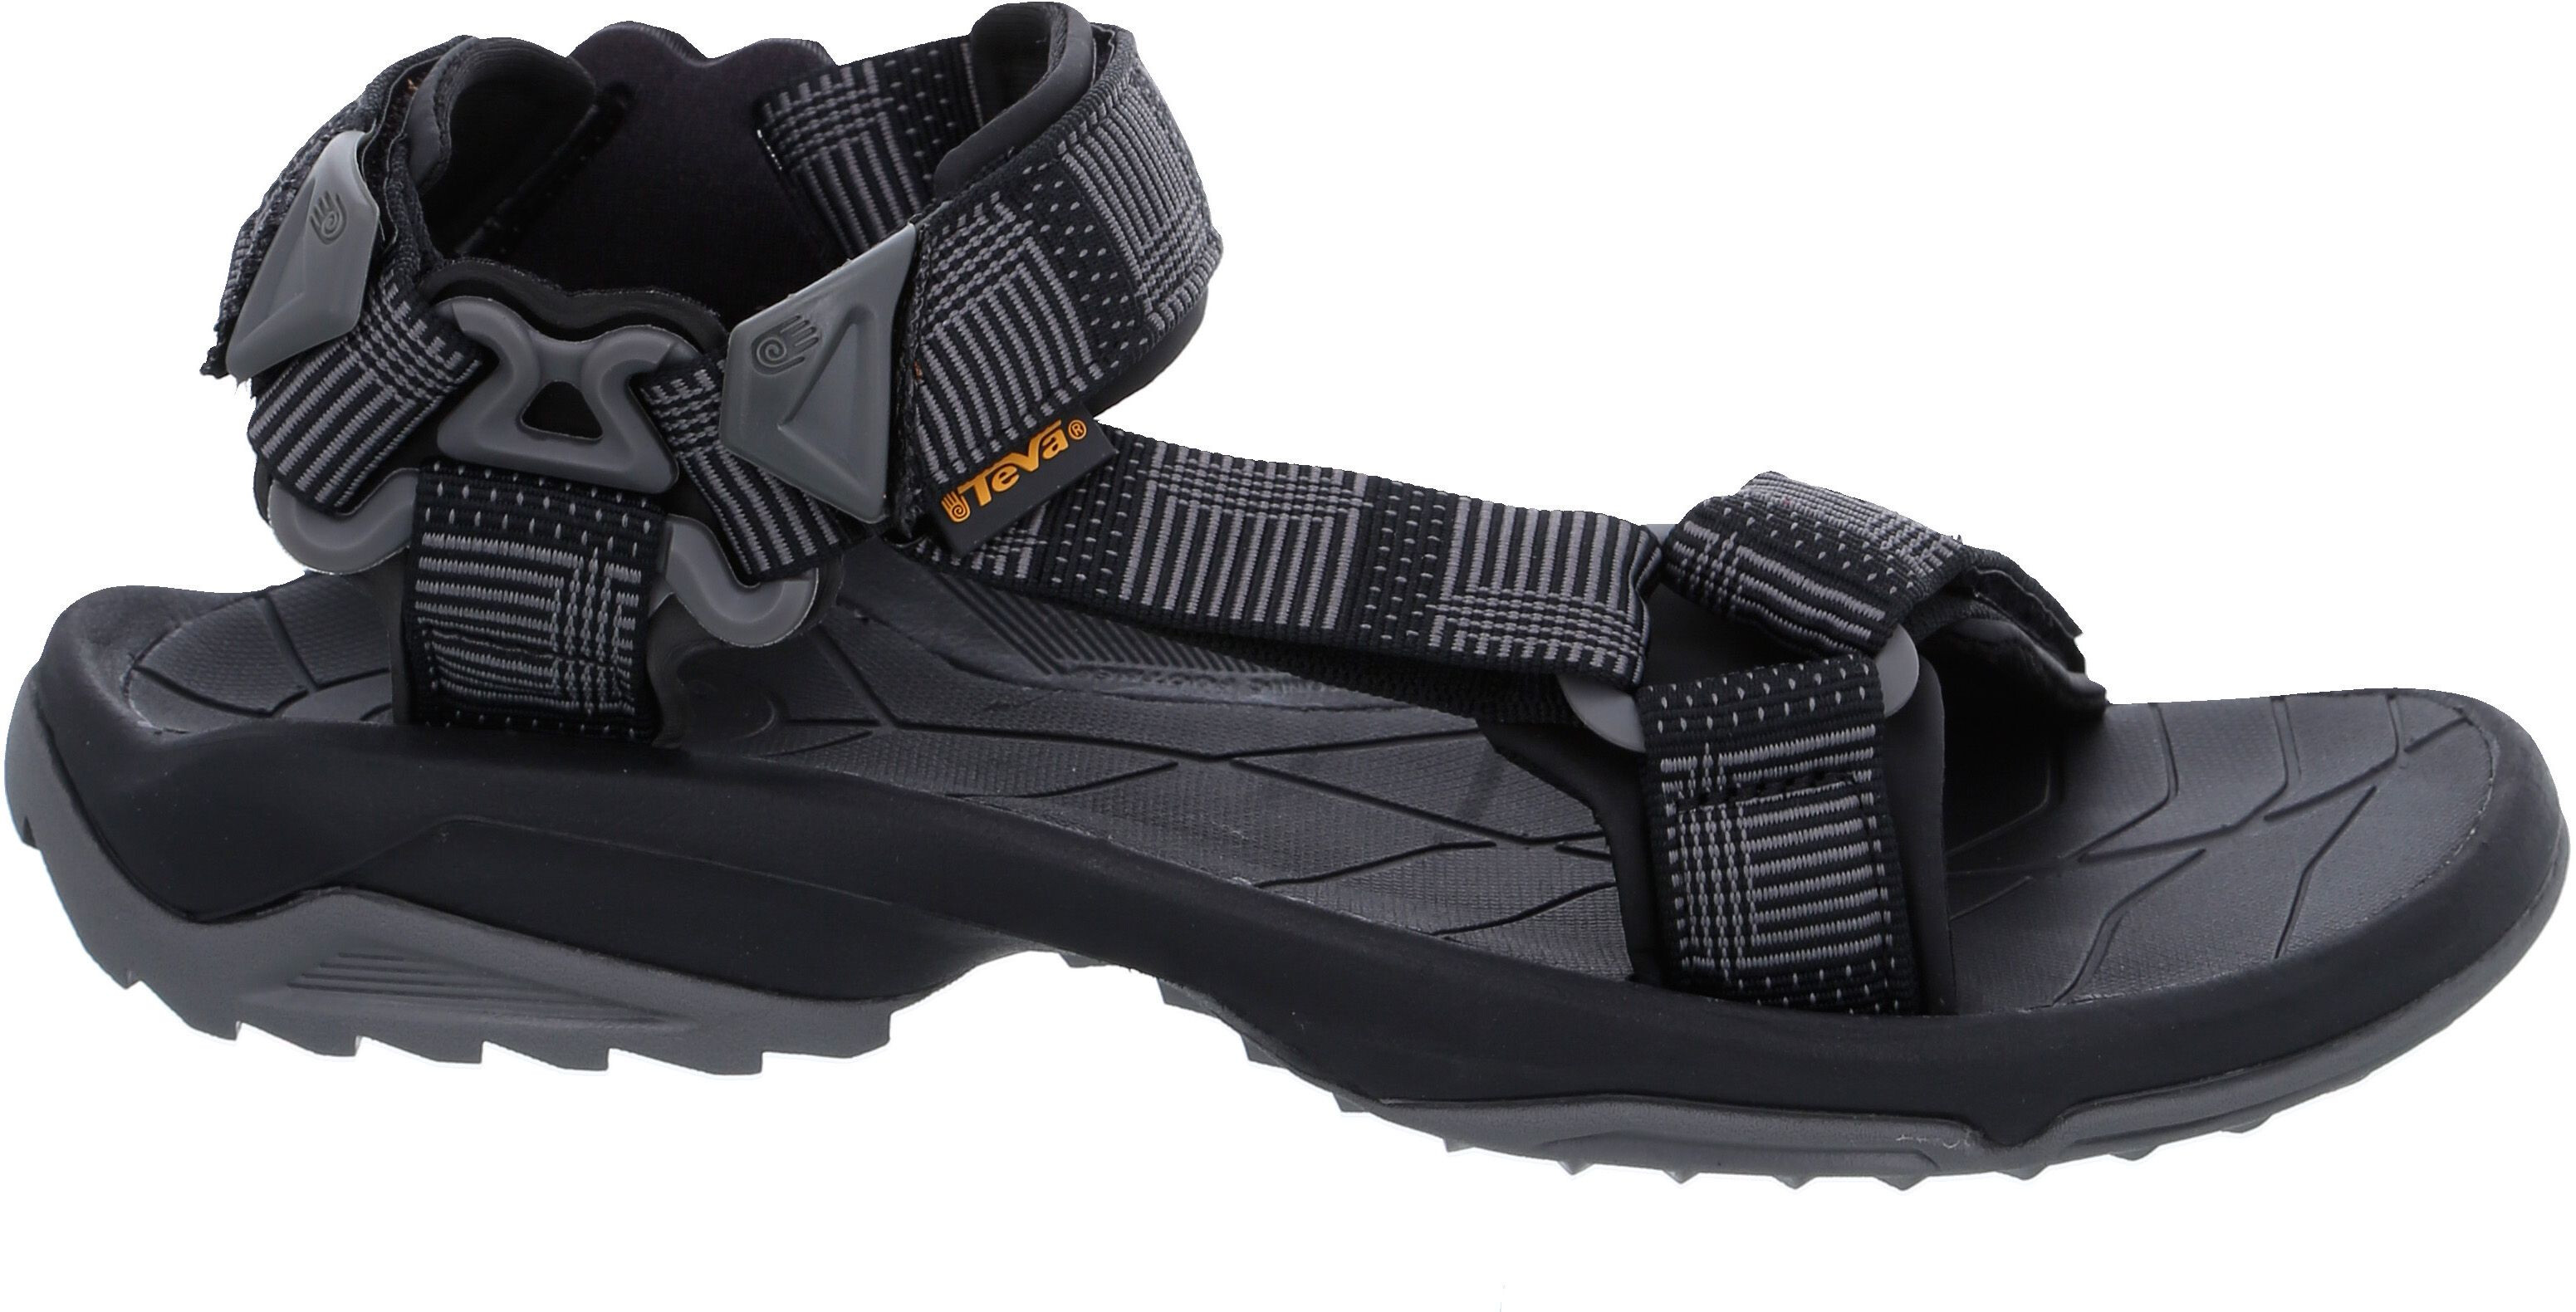 604901c7dfe8b0 Teva Terra Fi Lite Sandals Men grey black at Addnature.co.uk